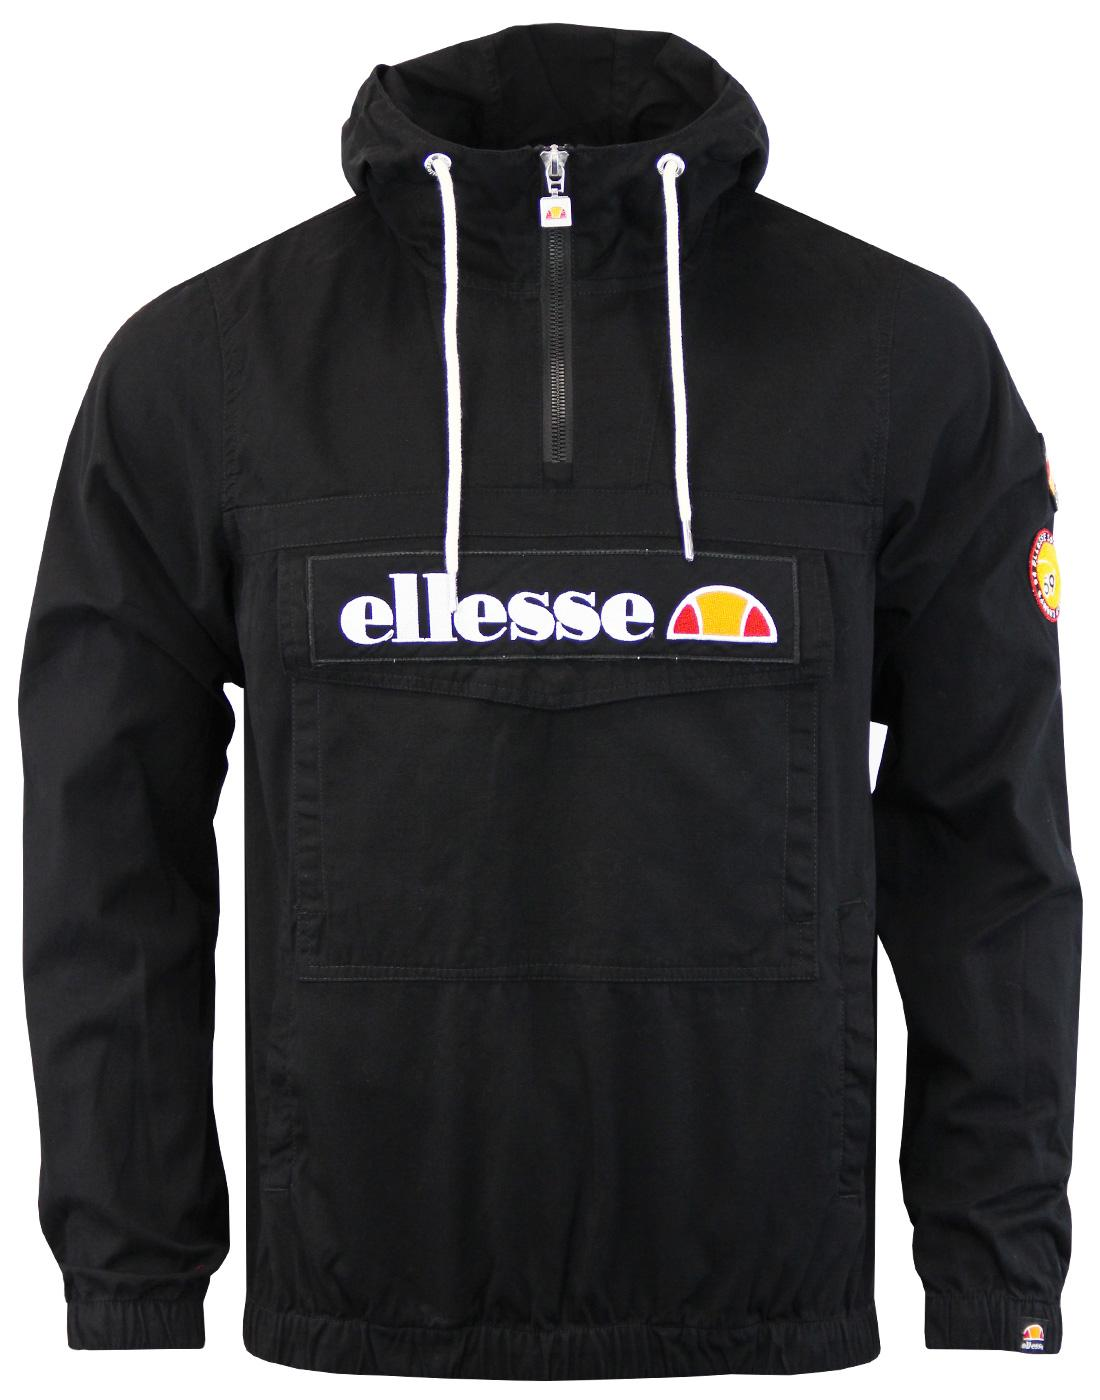 Monte ELLESSE Retro 80s Overhead Badge Jacket (A)